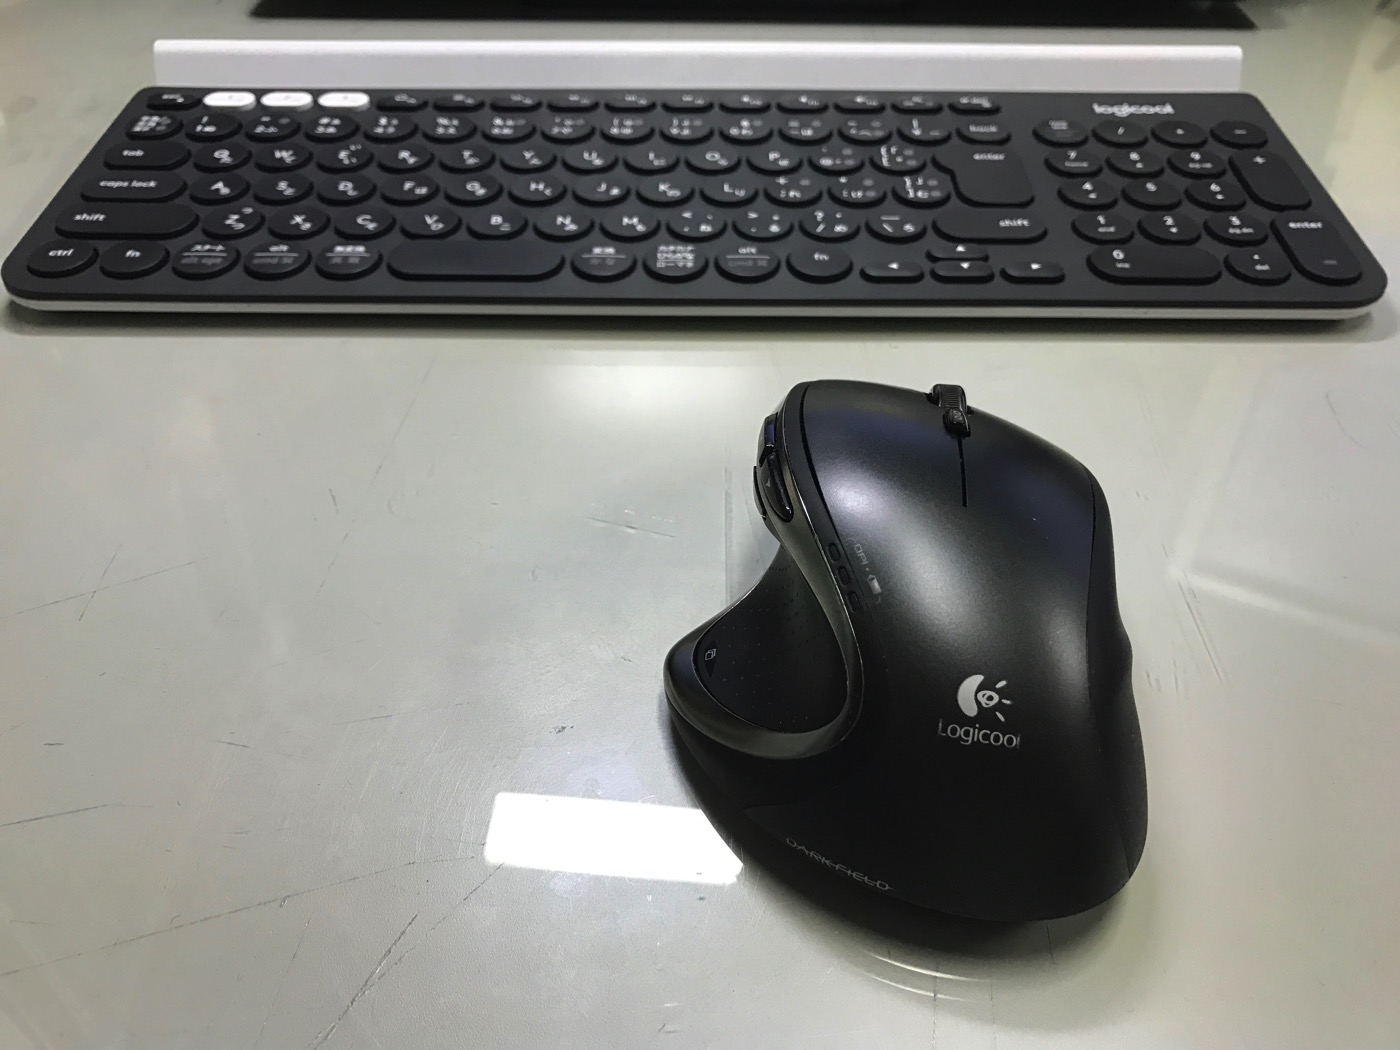 Logicool Mouse-7